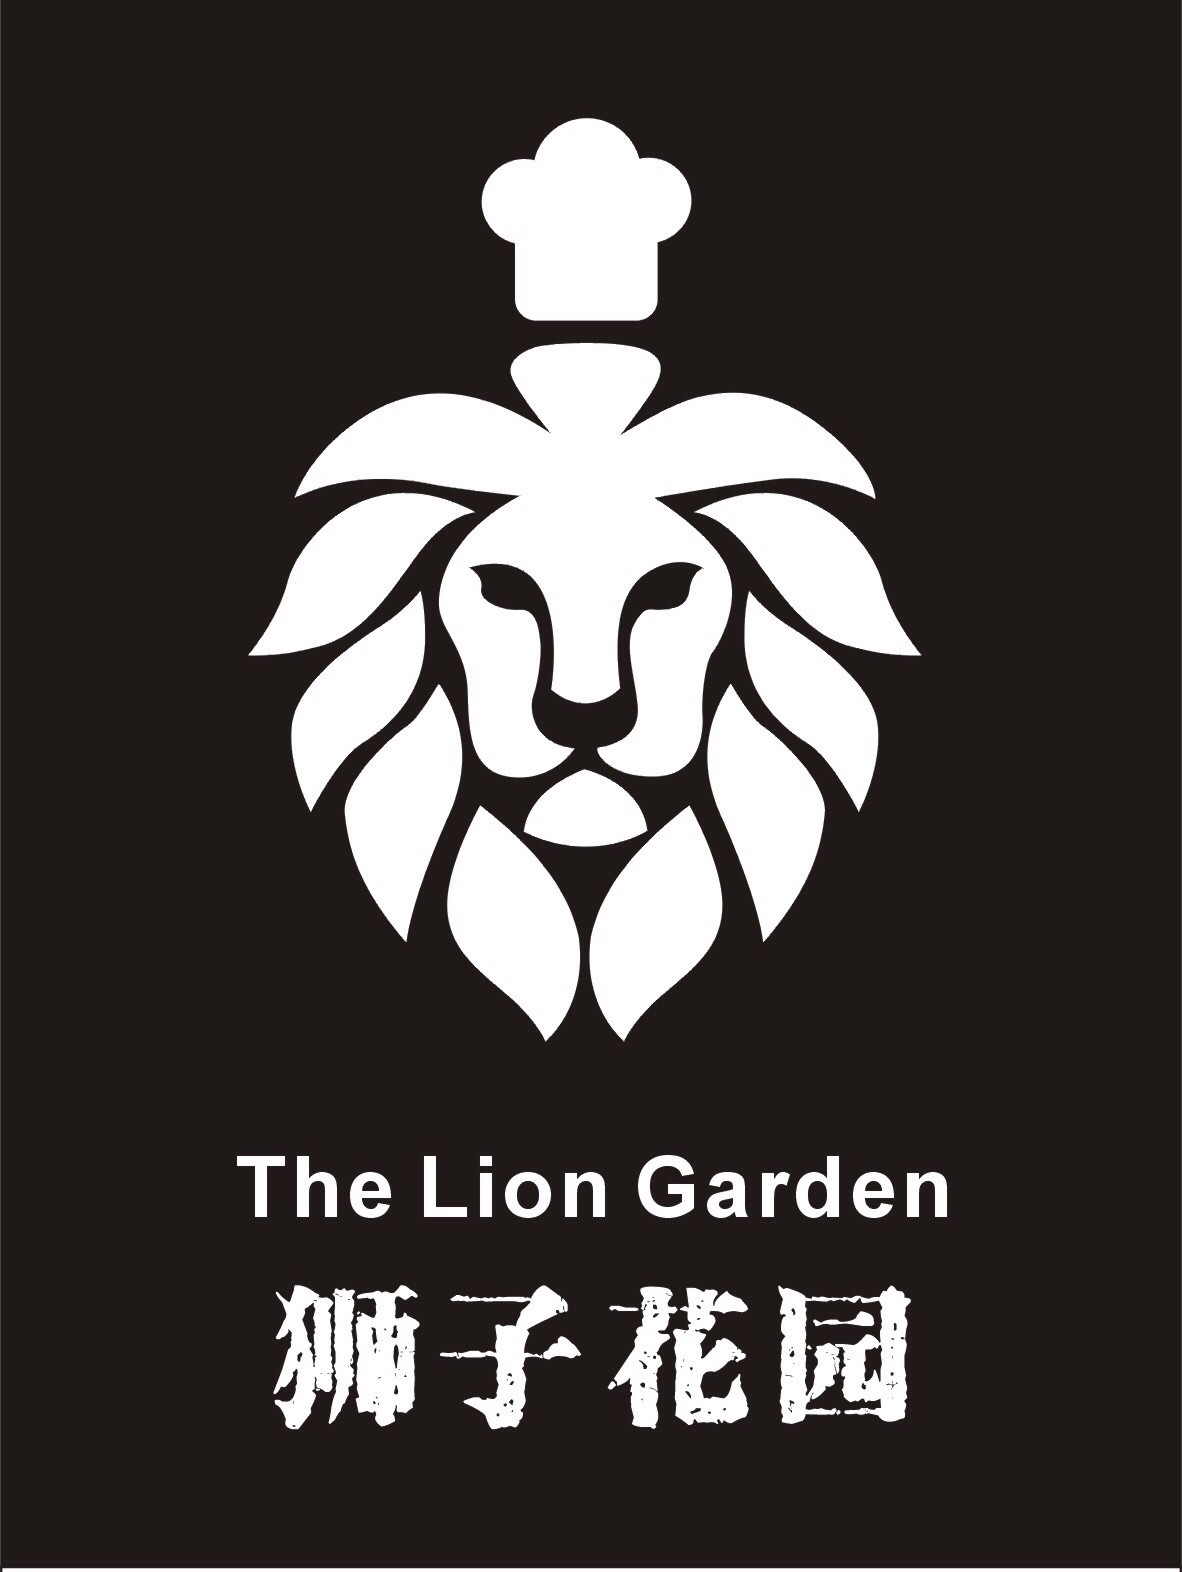 logo logo 标志 设计 矢量 矢量图 素材 图标 1182_1572 竖版 竖屏